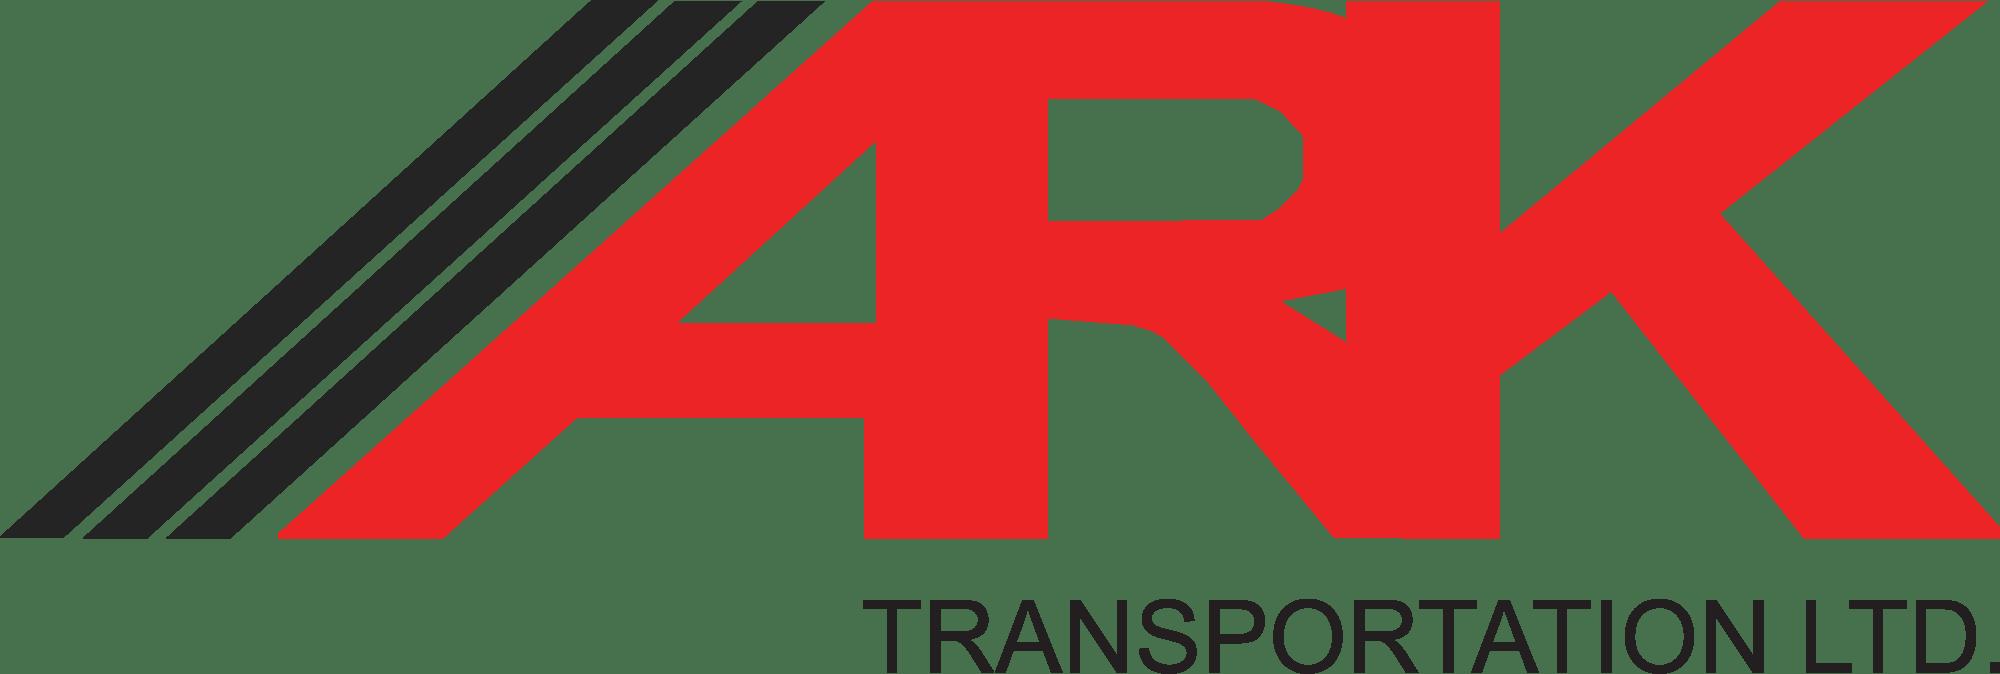 2431b120e5f0 Smart Freight Shipping and Logistics - Ark Transportation